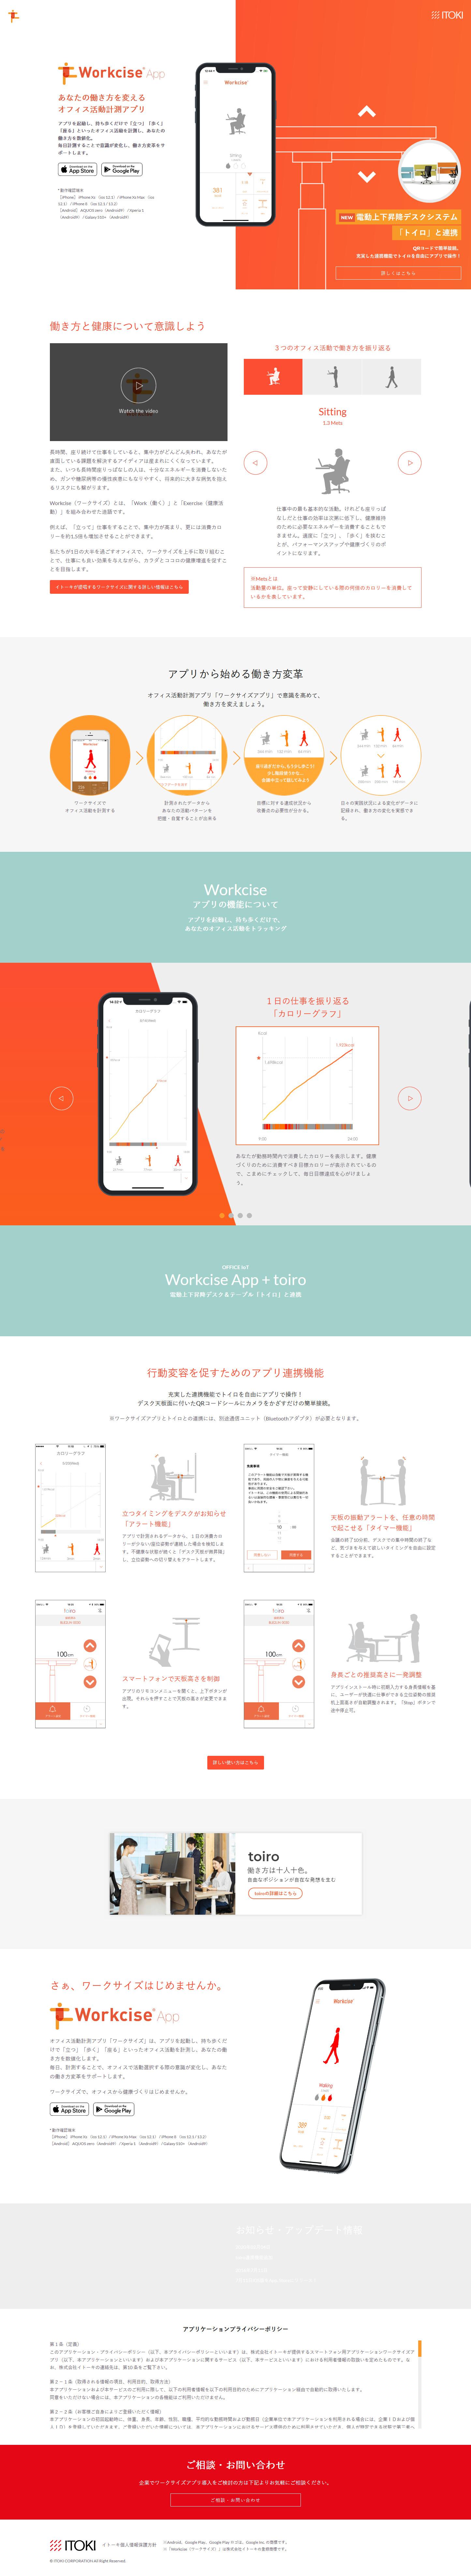 Workcise App